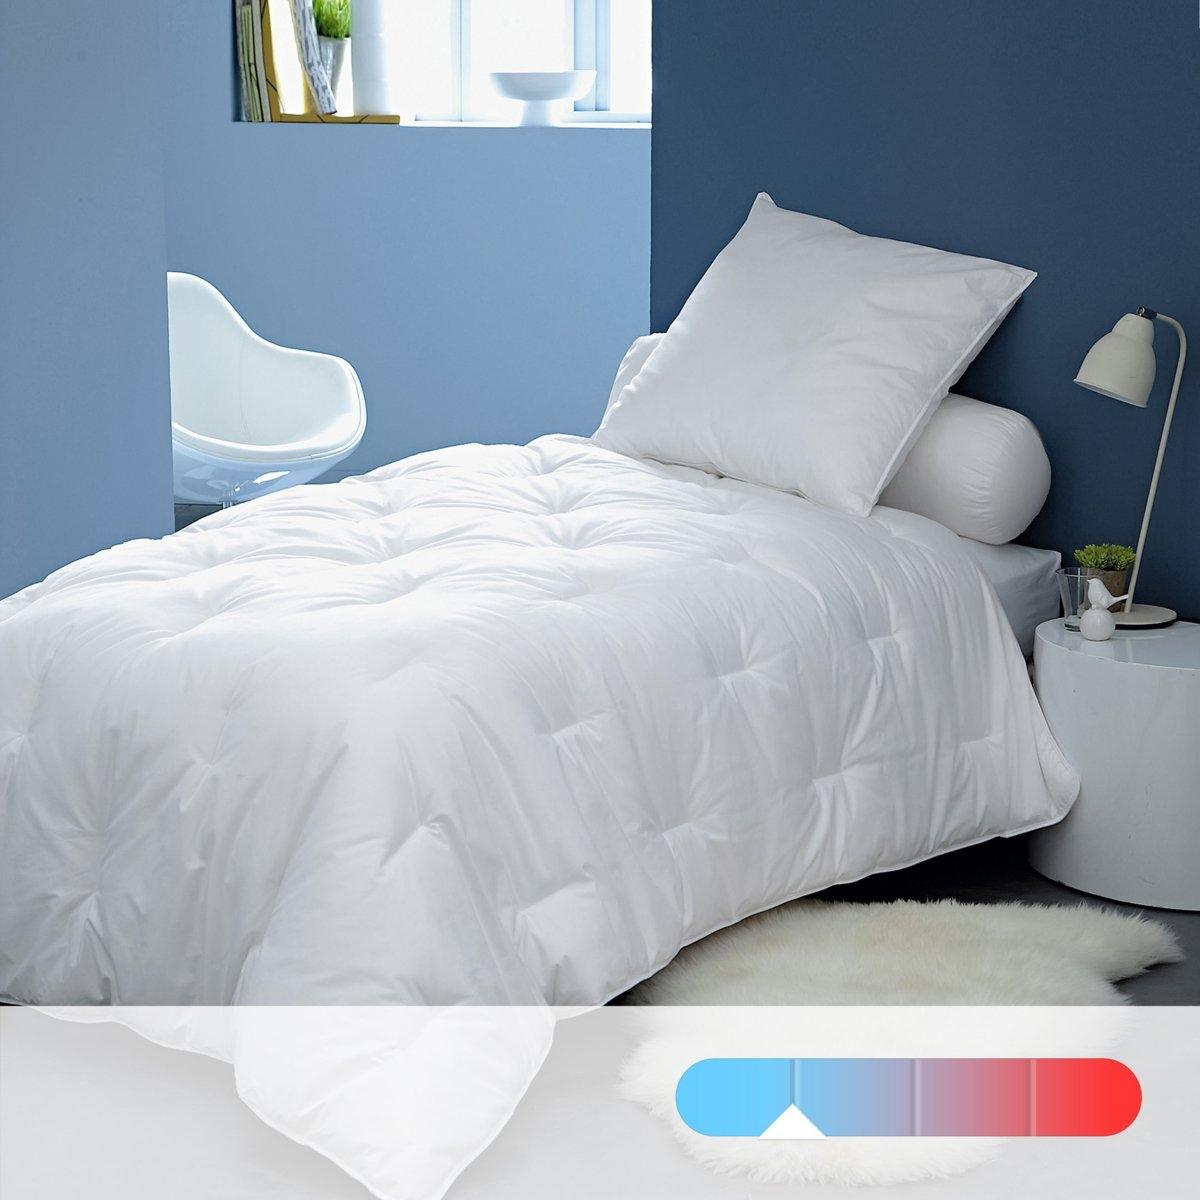 Синтетическое одеяло LESTRA, 175 г/м²